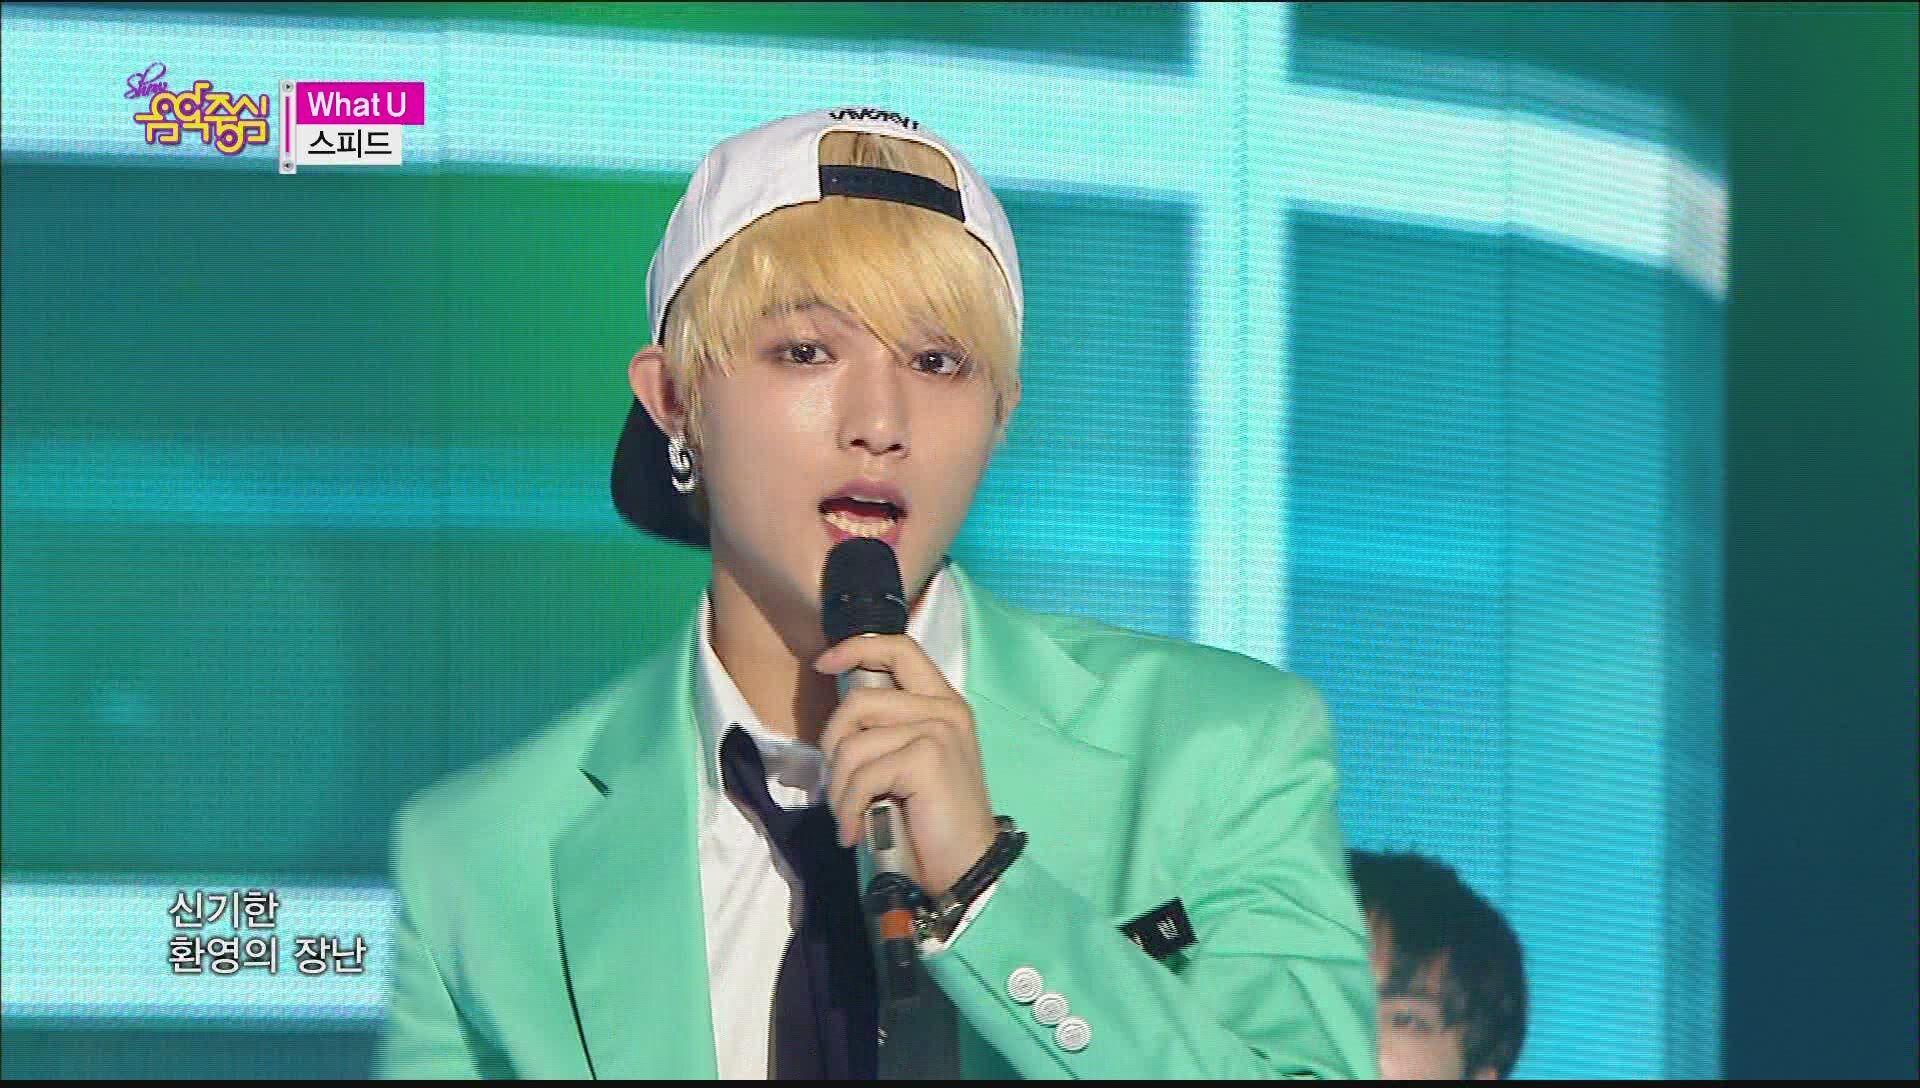 [HOT] SPEED - What U, 스피드 - 왓 유, Show Music core 20150606